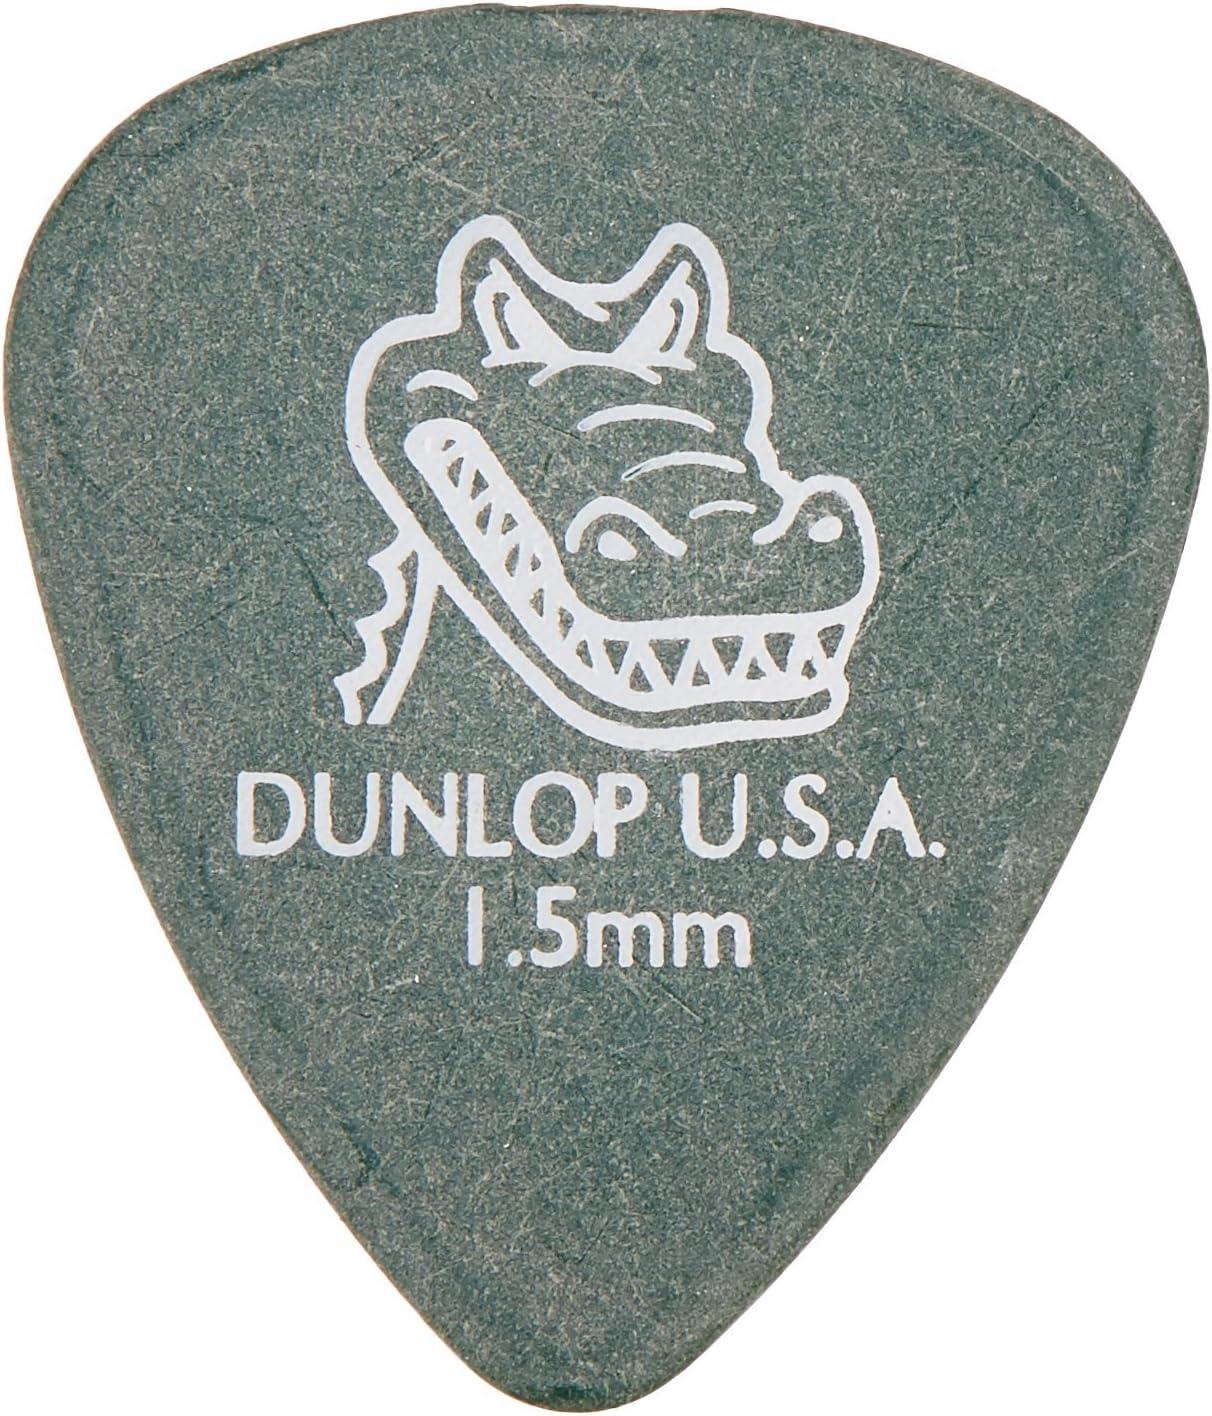 417P1.14 Dunlop Gator Grip 12 Pack